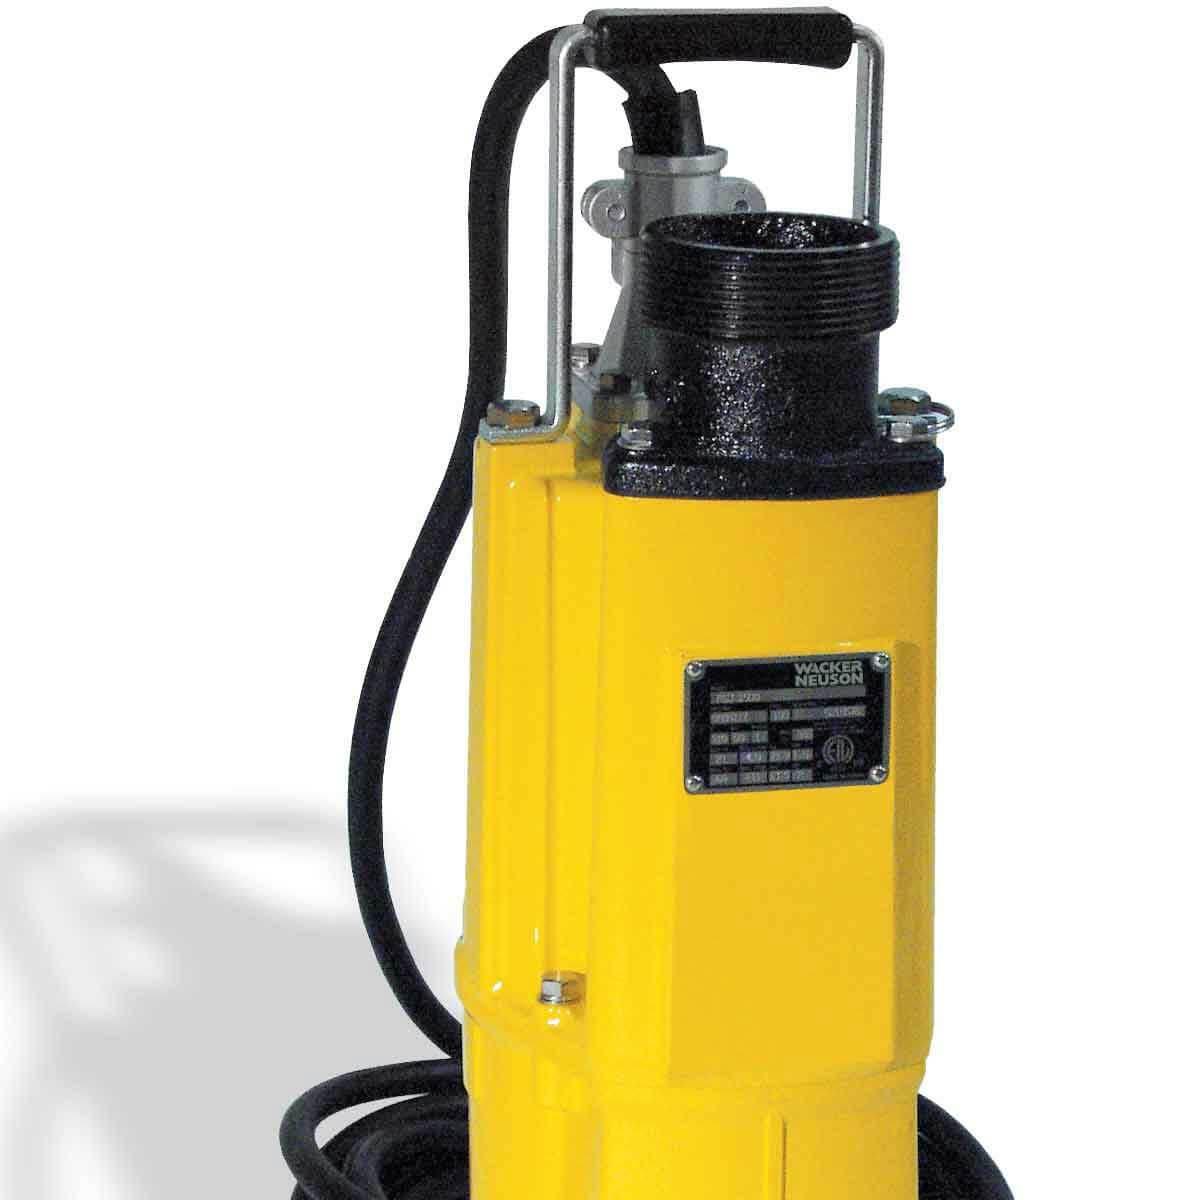 Wacker Neuson 3 inch Submersible Water Pump 220V PS31500